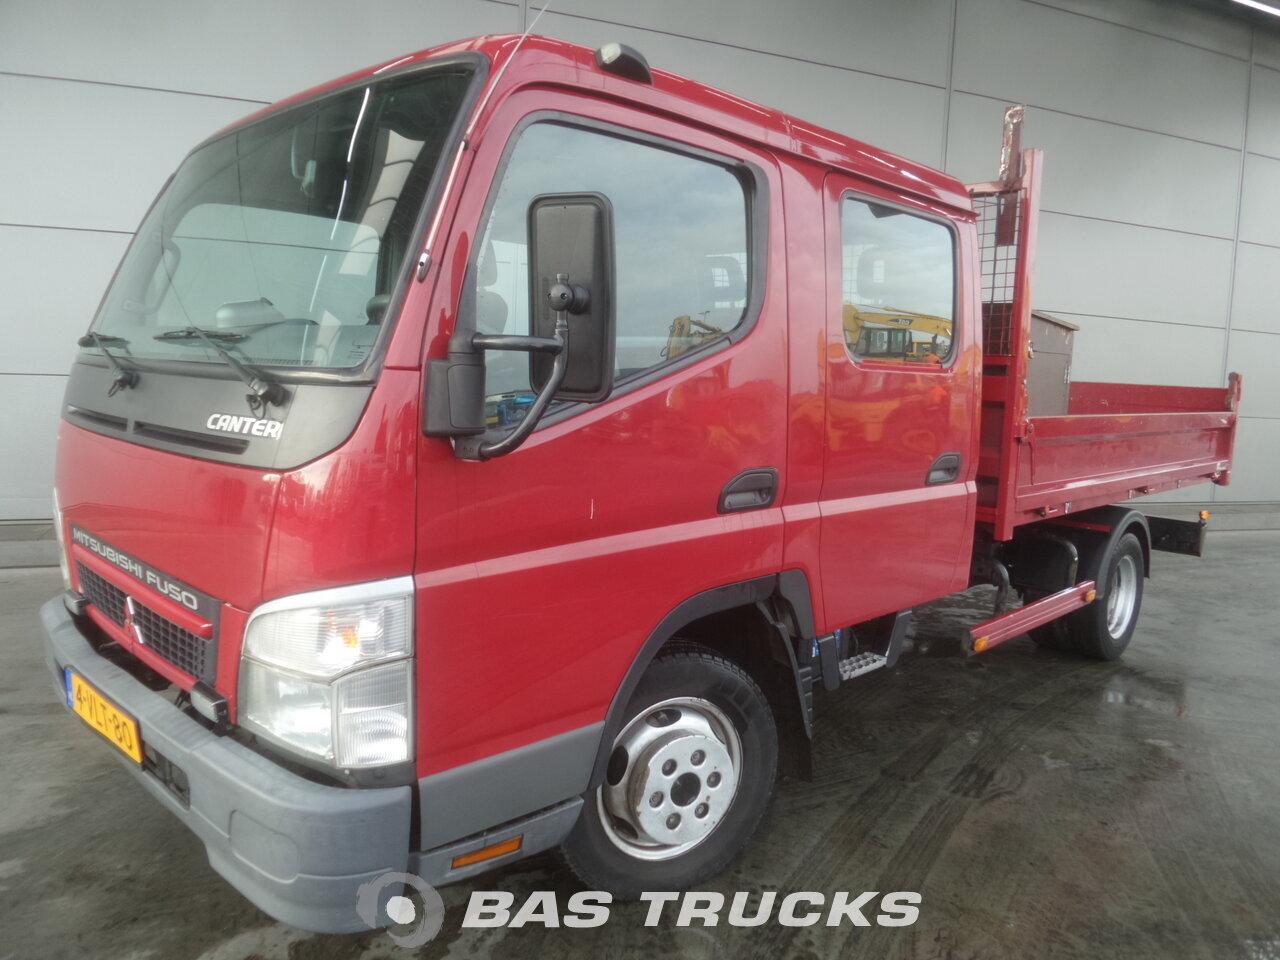 For sale at BAS Vans: Mitsubishi Fuso Canter 06/2008